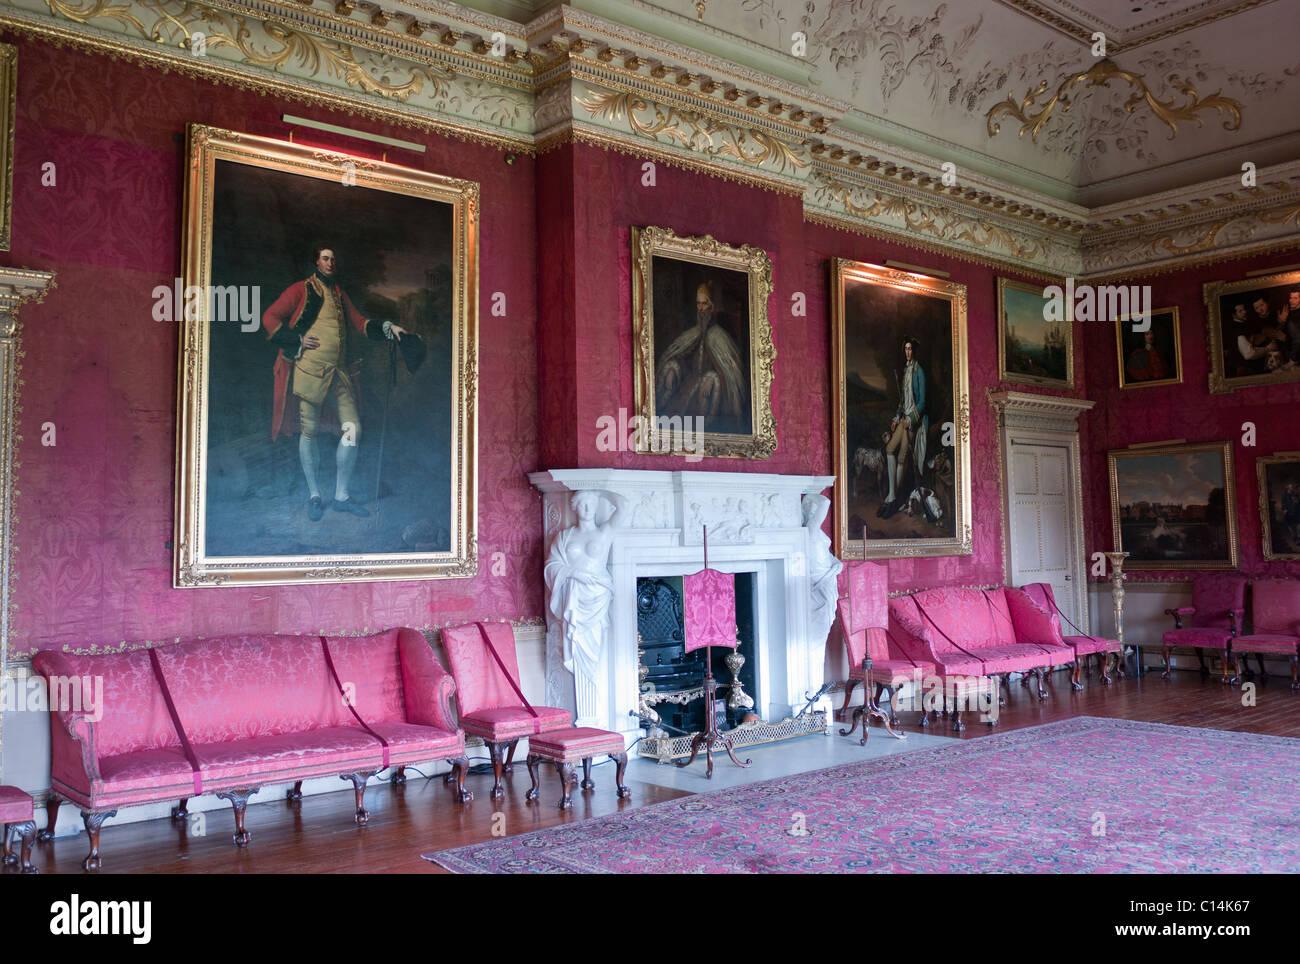 HOPETOUN HOUSE  EDINBURGH SCOTLAND  UNITED KINGDOM Stock Photo